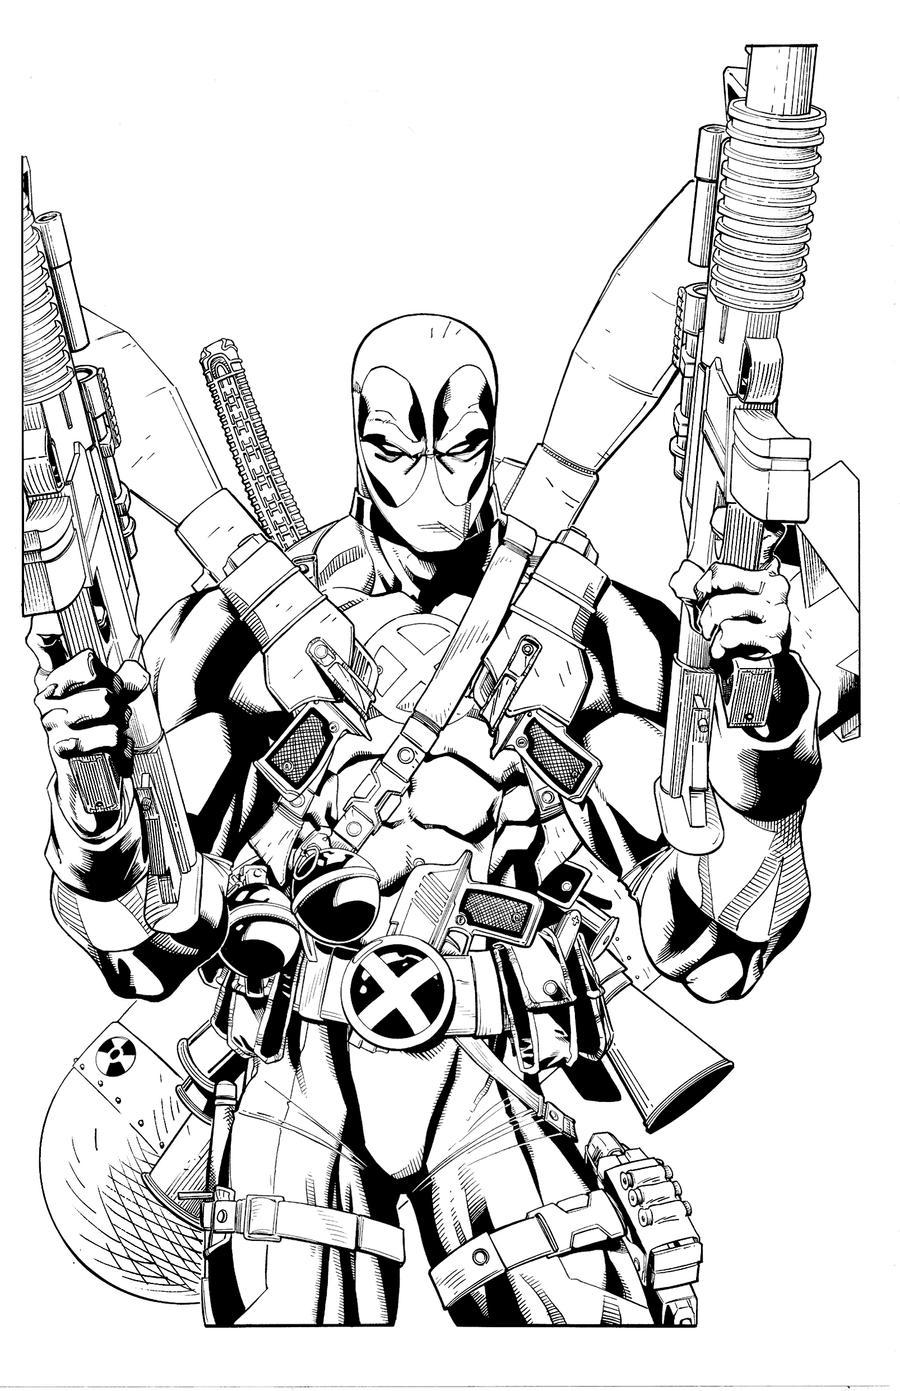 Deadpool fully loaded by antalas on DeviantArt